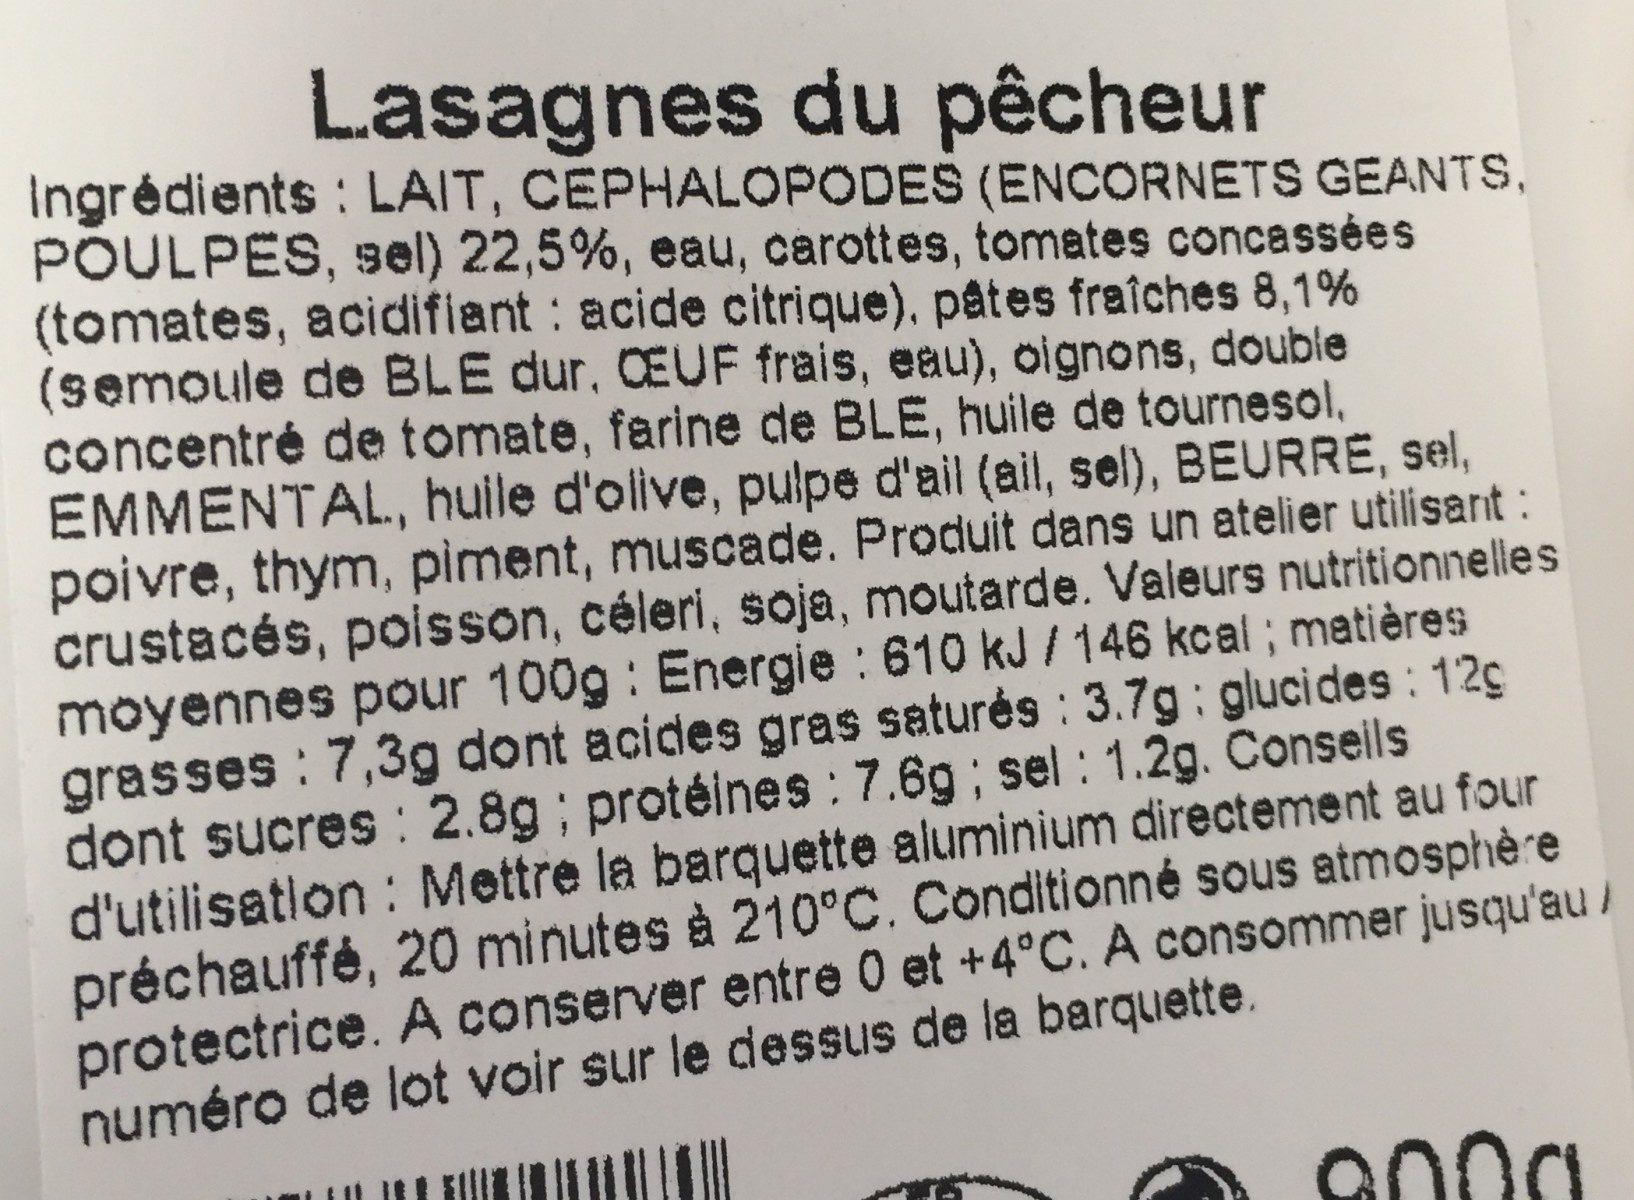 Lasagnes du pêcheur farce sétoise - Ingrediënten